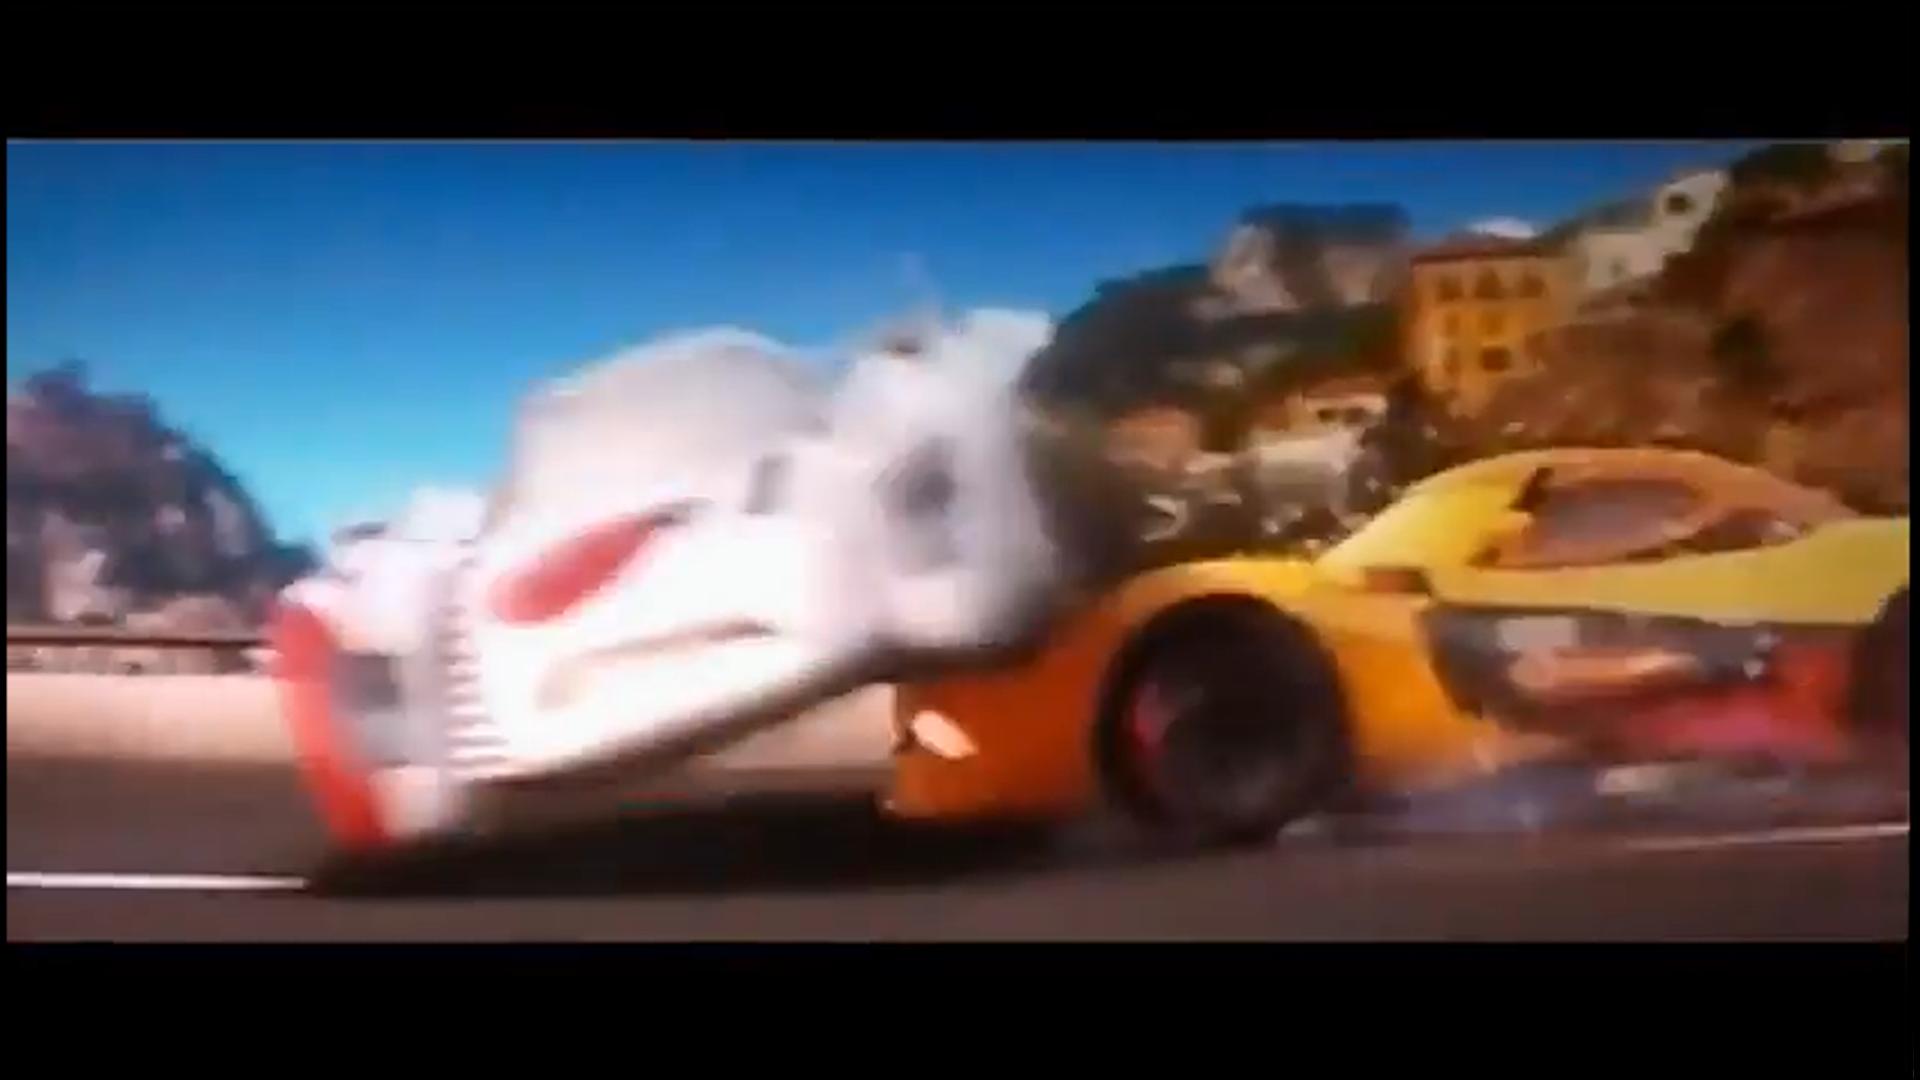 Image miguel camino crashes into shu pixar wiki fandom powered by wikia - Coloriage cars 2 miguel camino ...